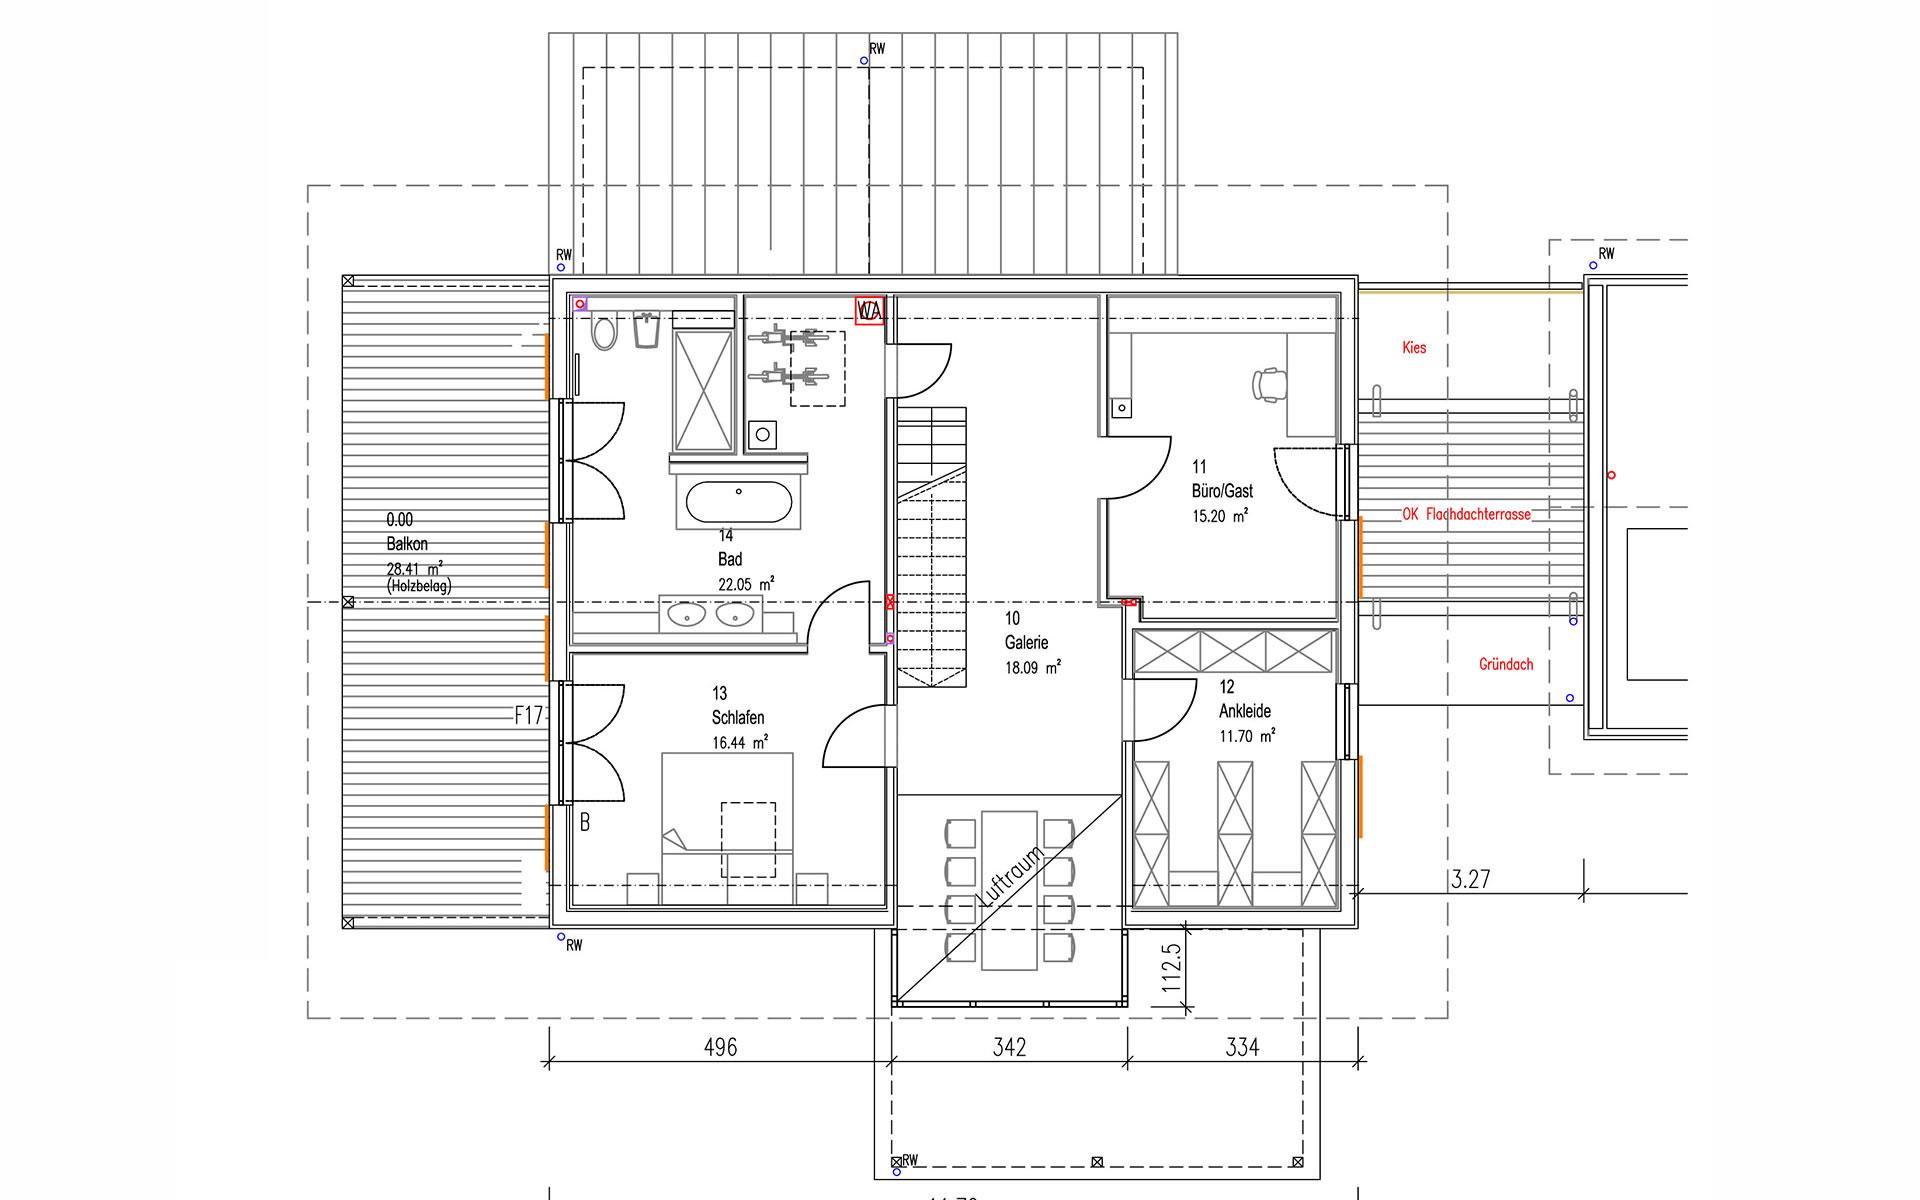 Dachgeschoss Niederhofer von Sonnleitner Holzbauwerke GmbH & Co. KG